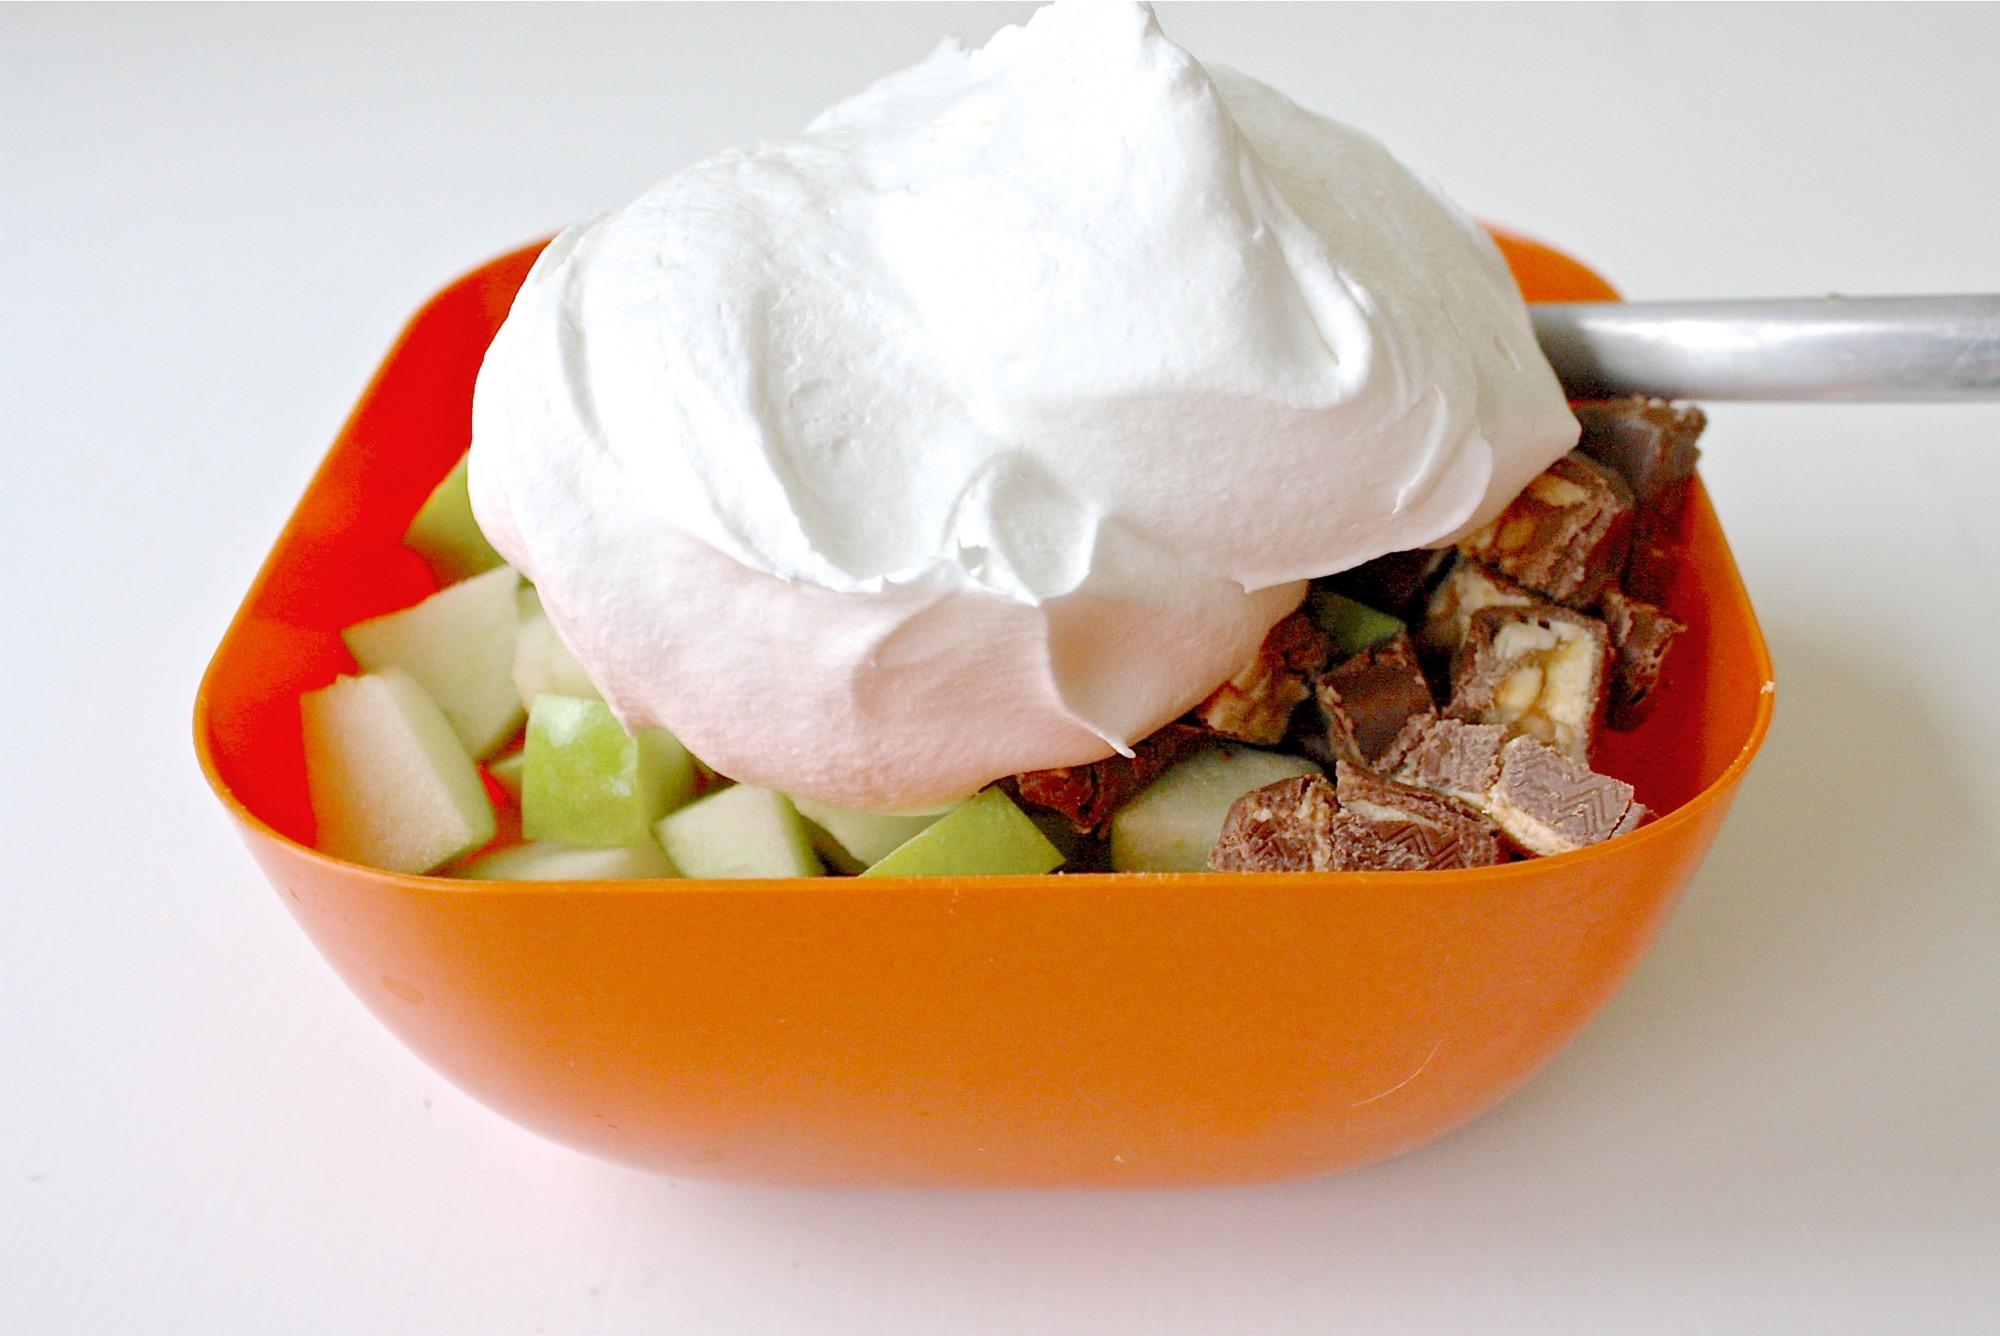 Candy Bar Salad – MADE EVERYDAY